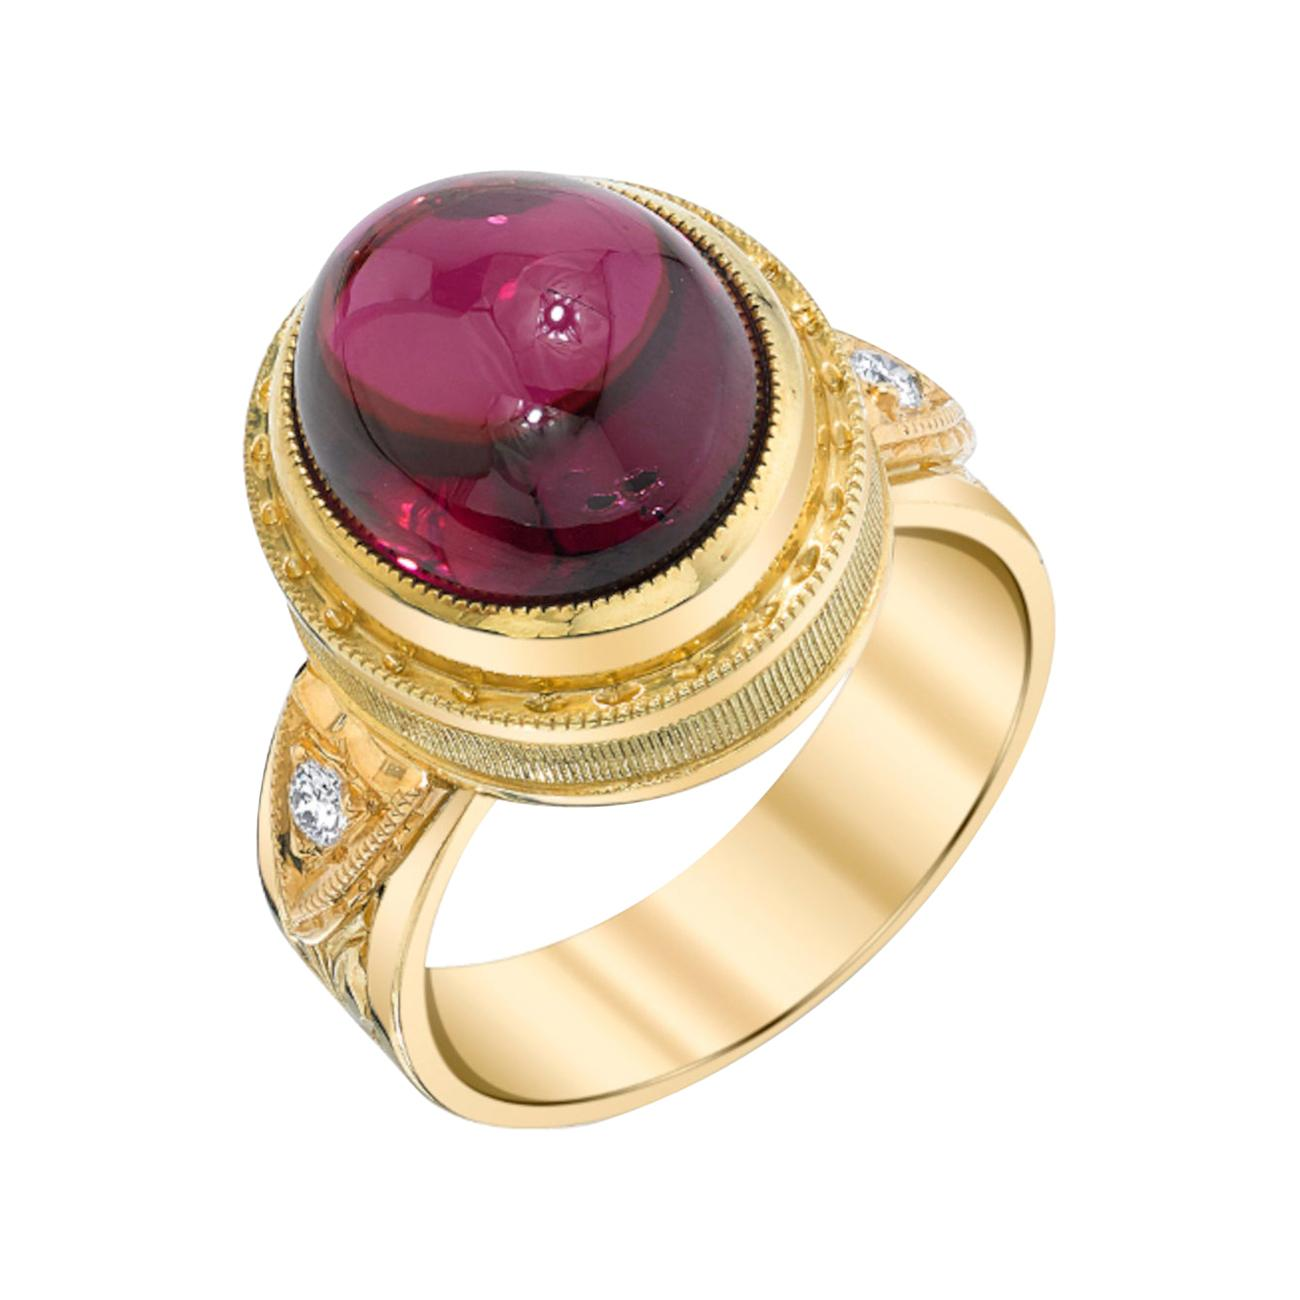 11.39 Ct Rubellite Tourmaline Cabochon, Diamond Yellow Gold Engraved Dome Ring